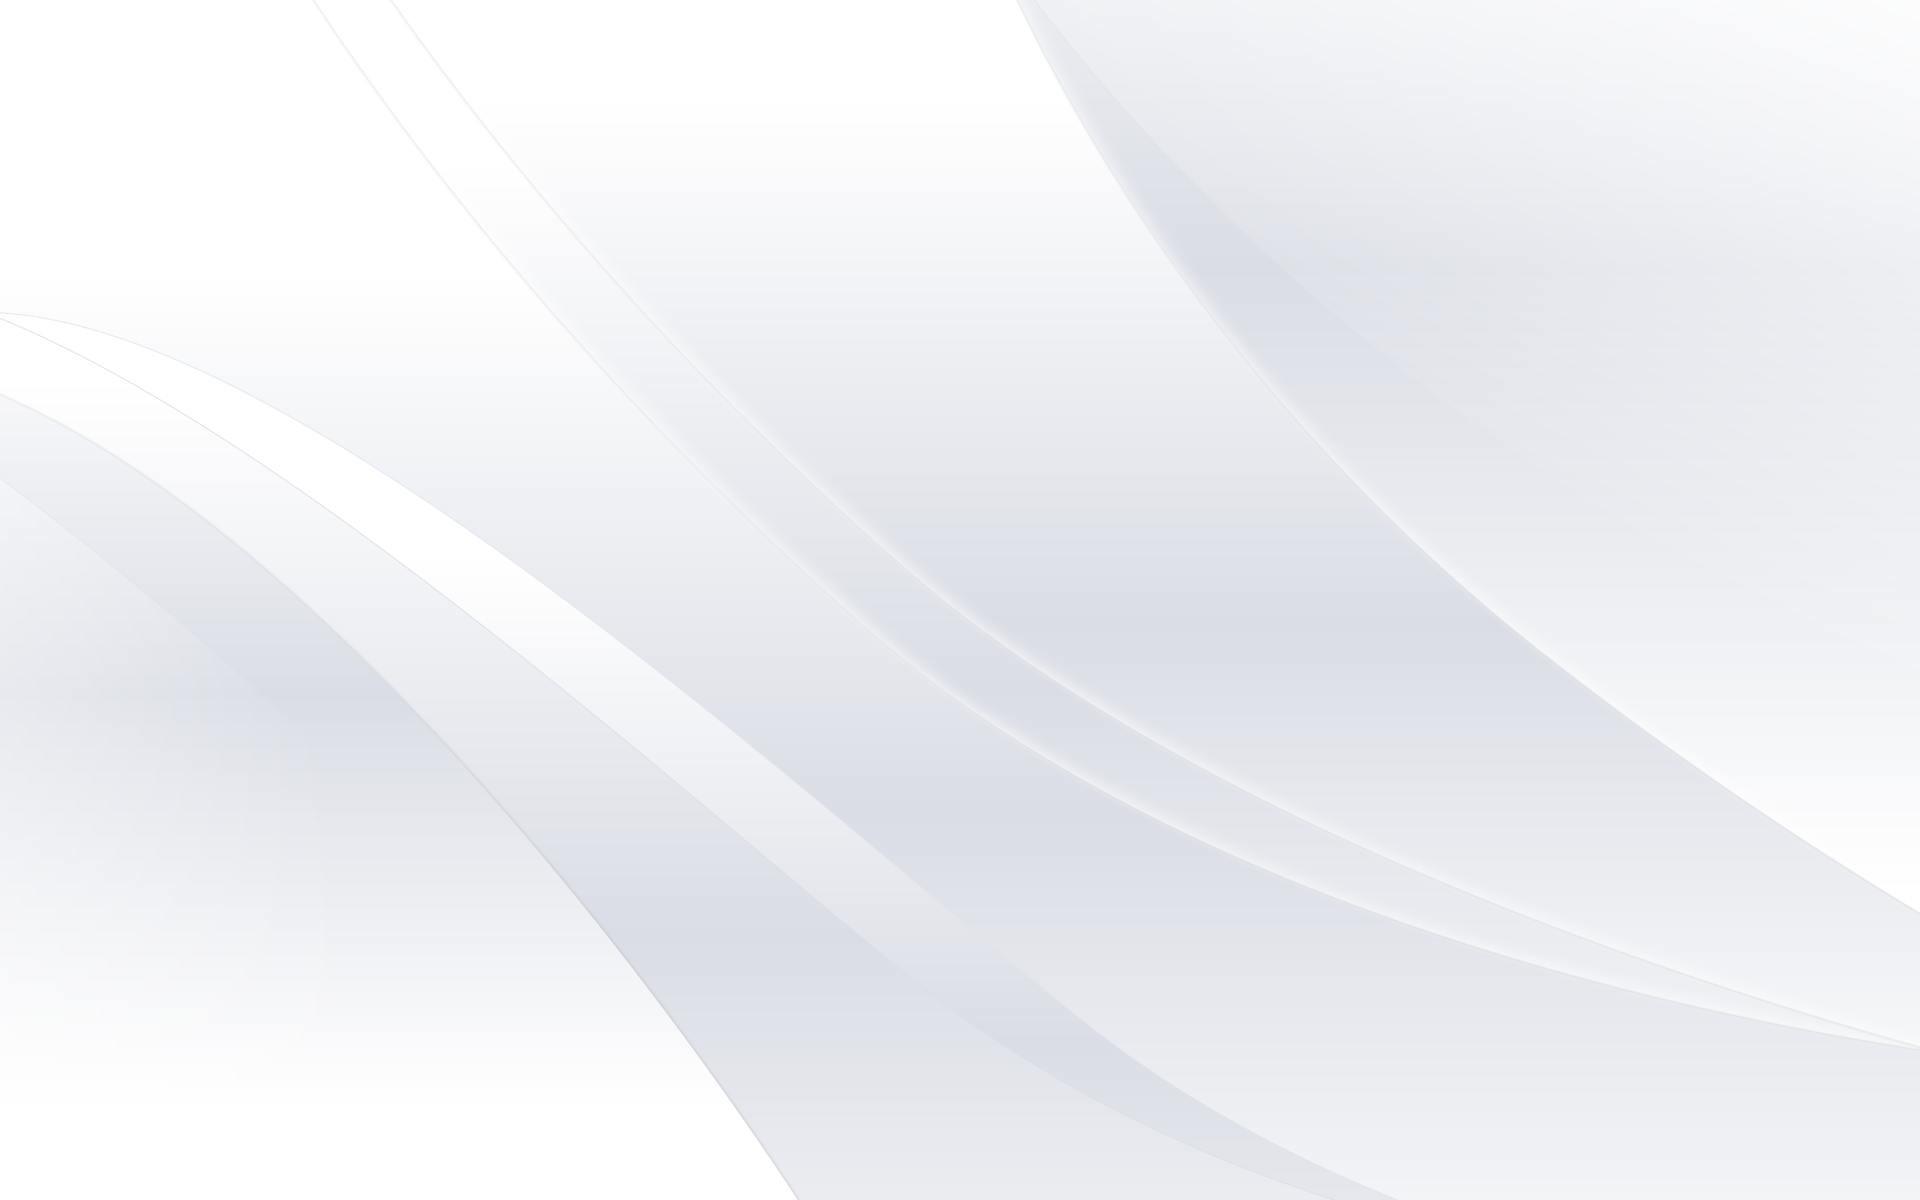 Blank Wallpapers – Full HD wallpaper search